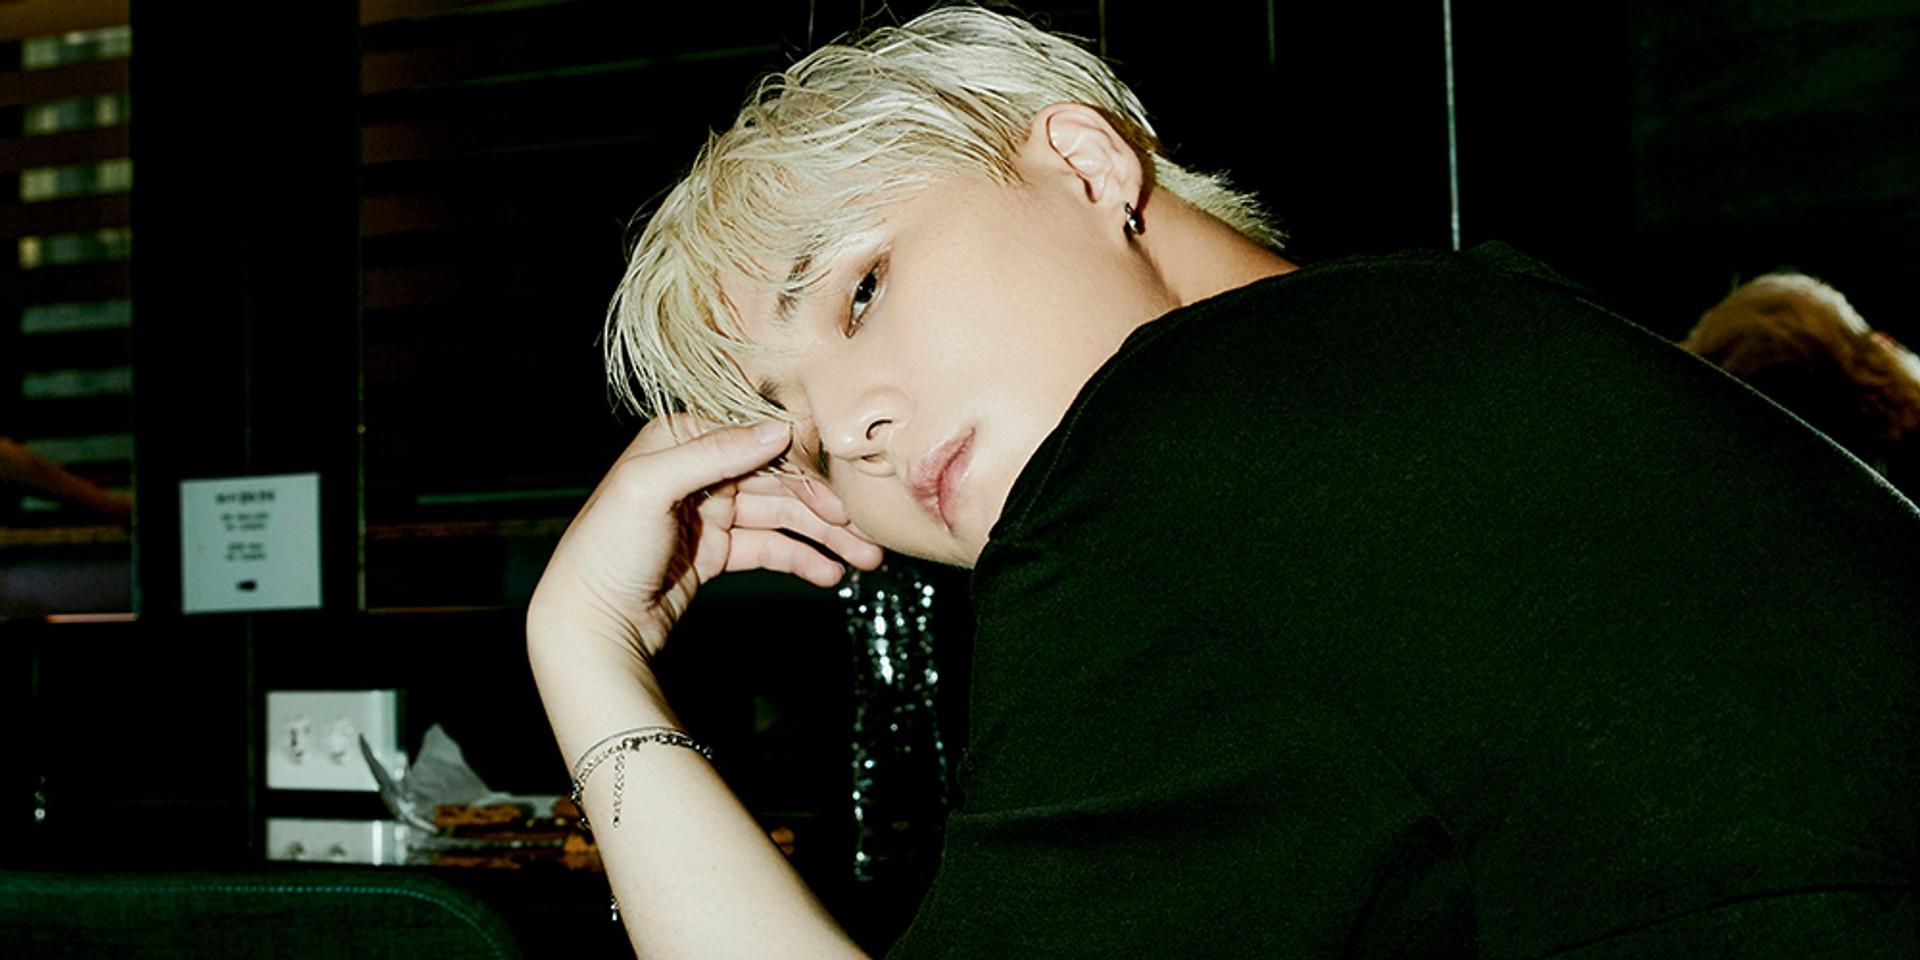 DAY6's Young K promises forever in debut mini-album 'Eternal' – listen